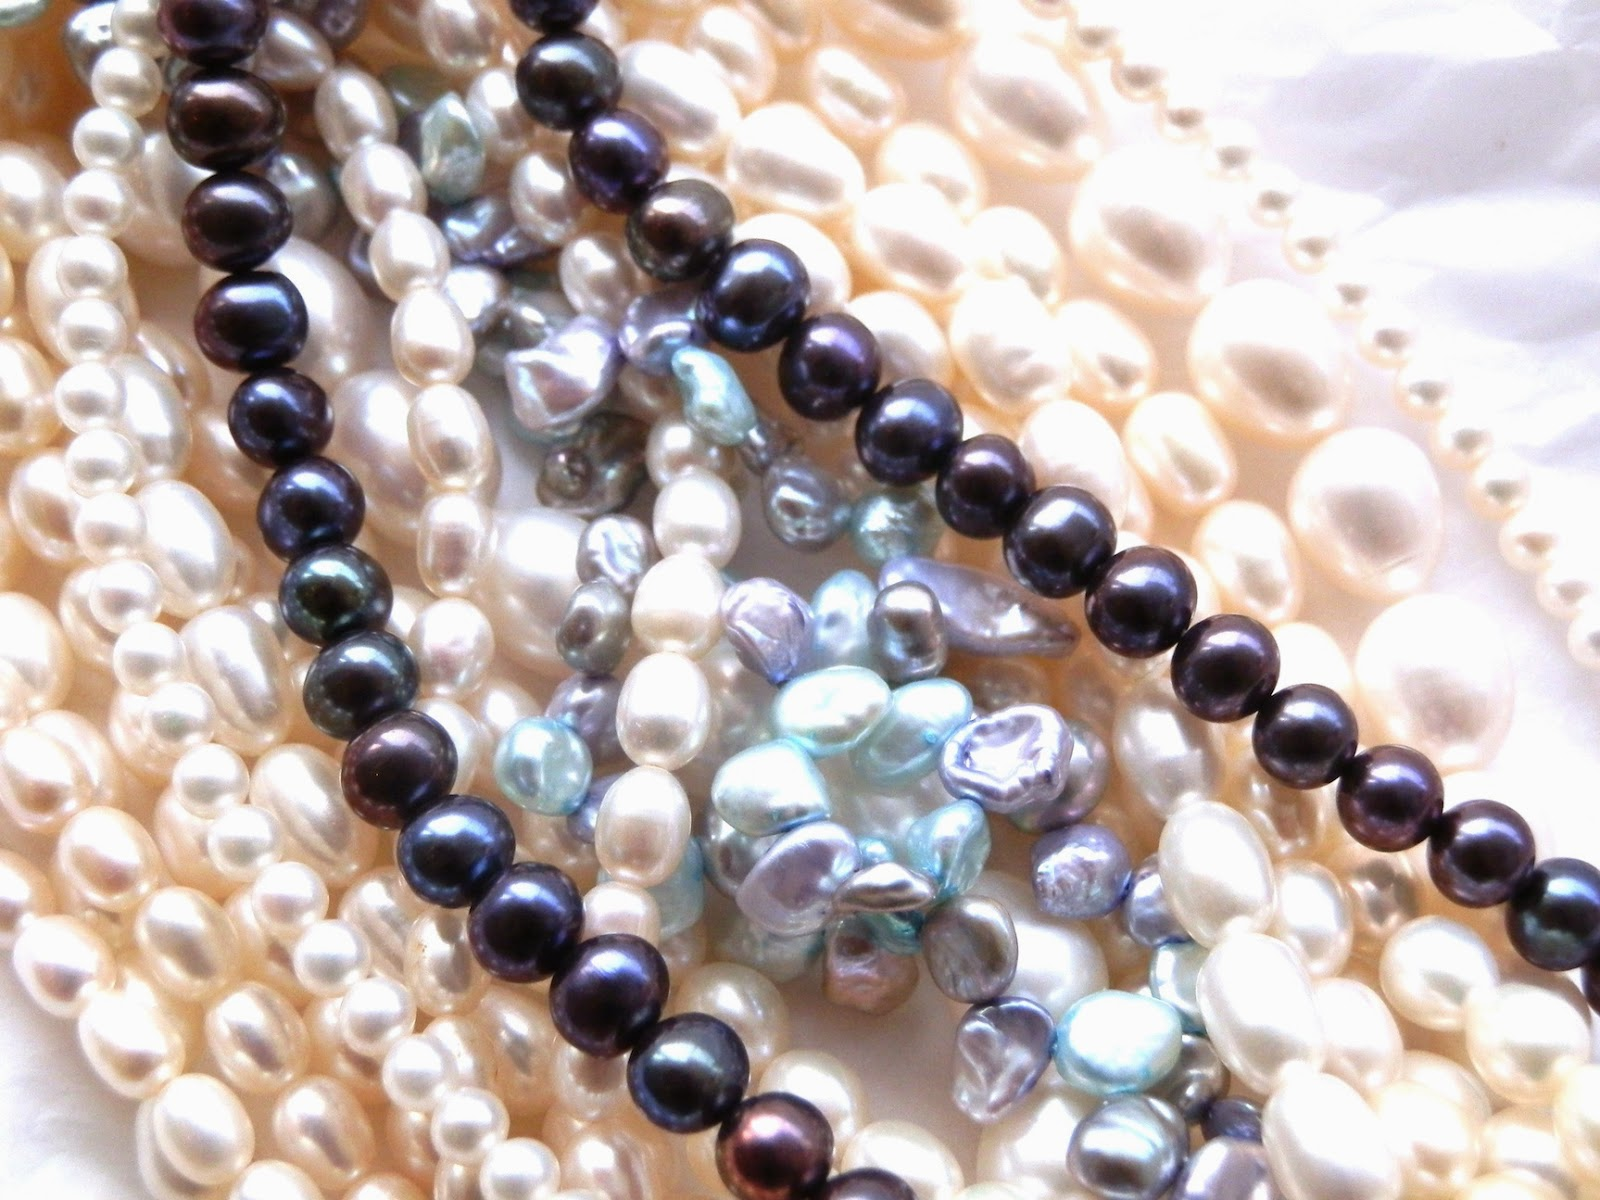 http://www.kirstytaylorjewellery.com/96-pearls